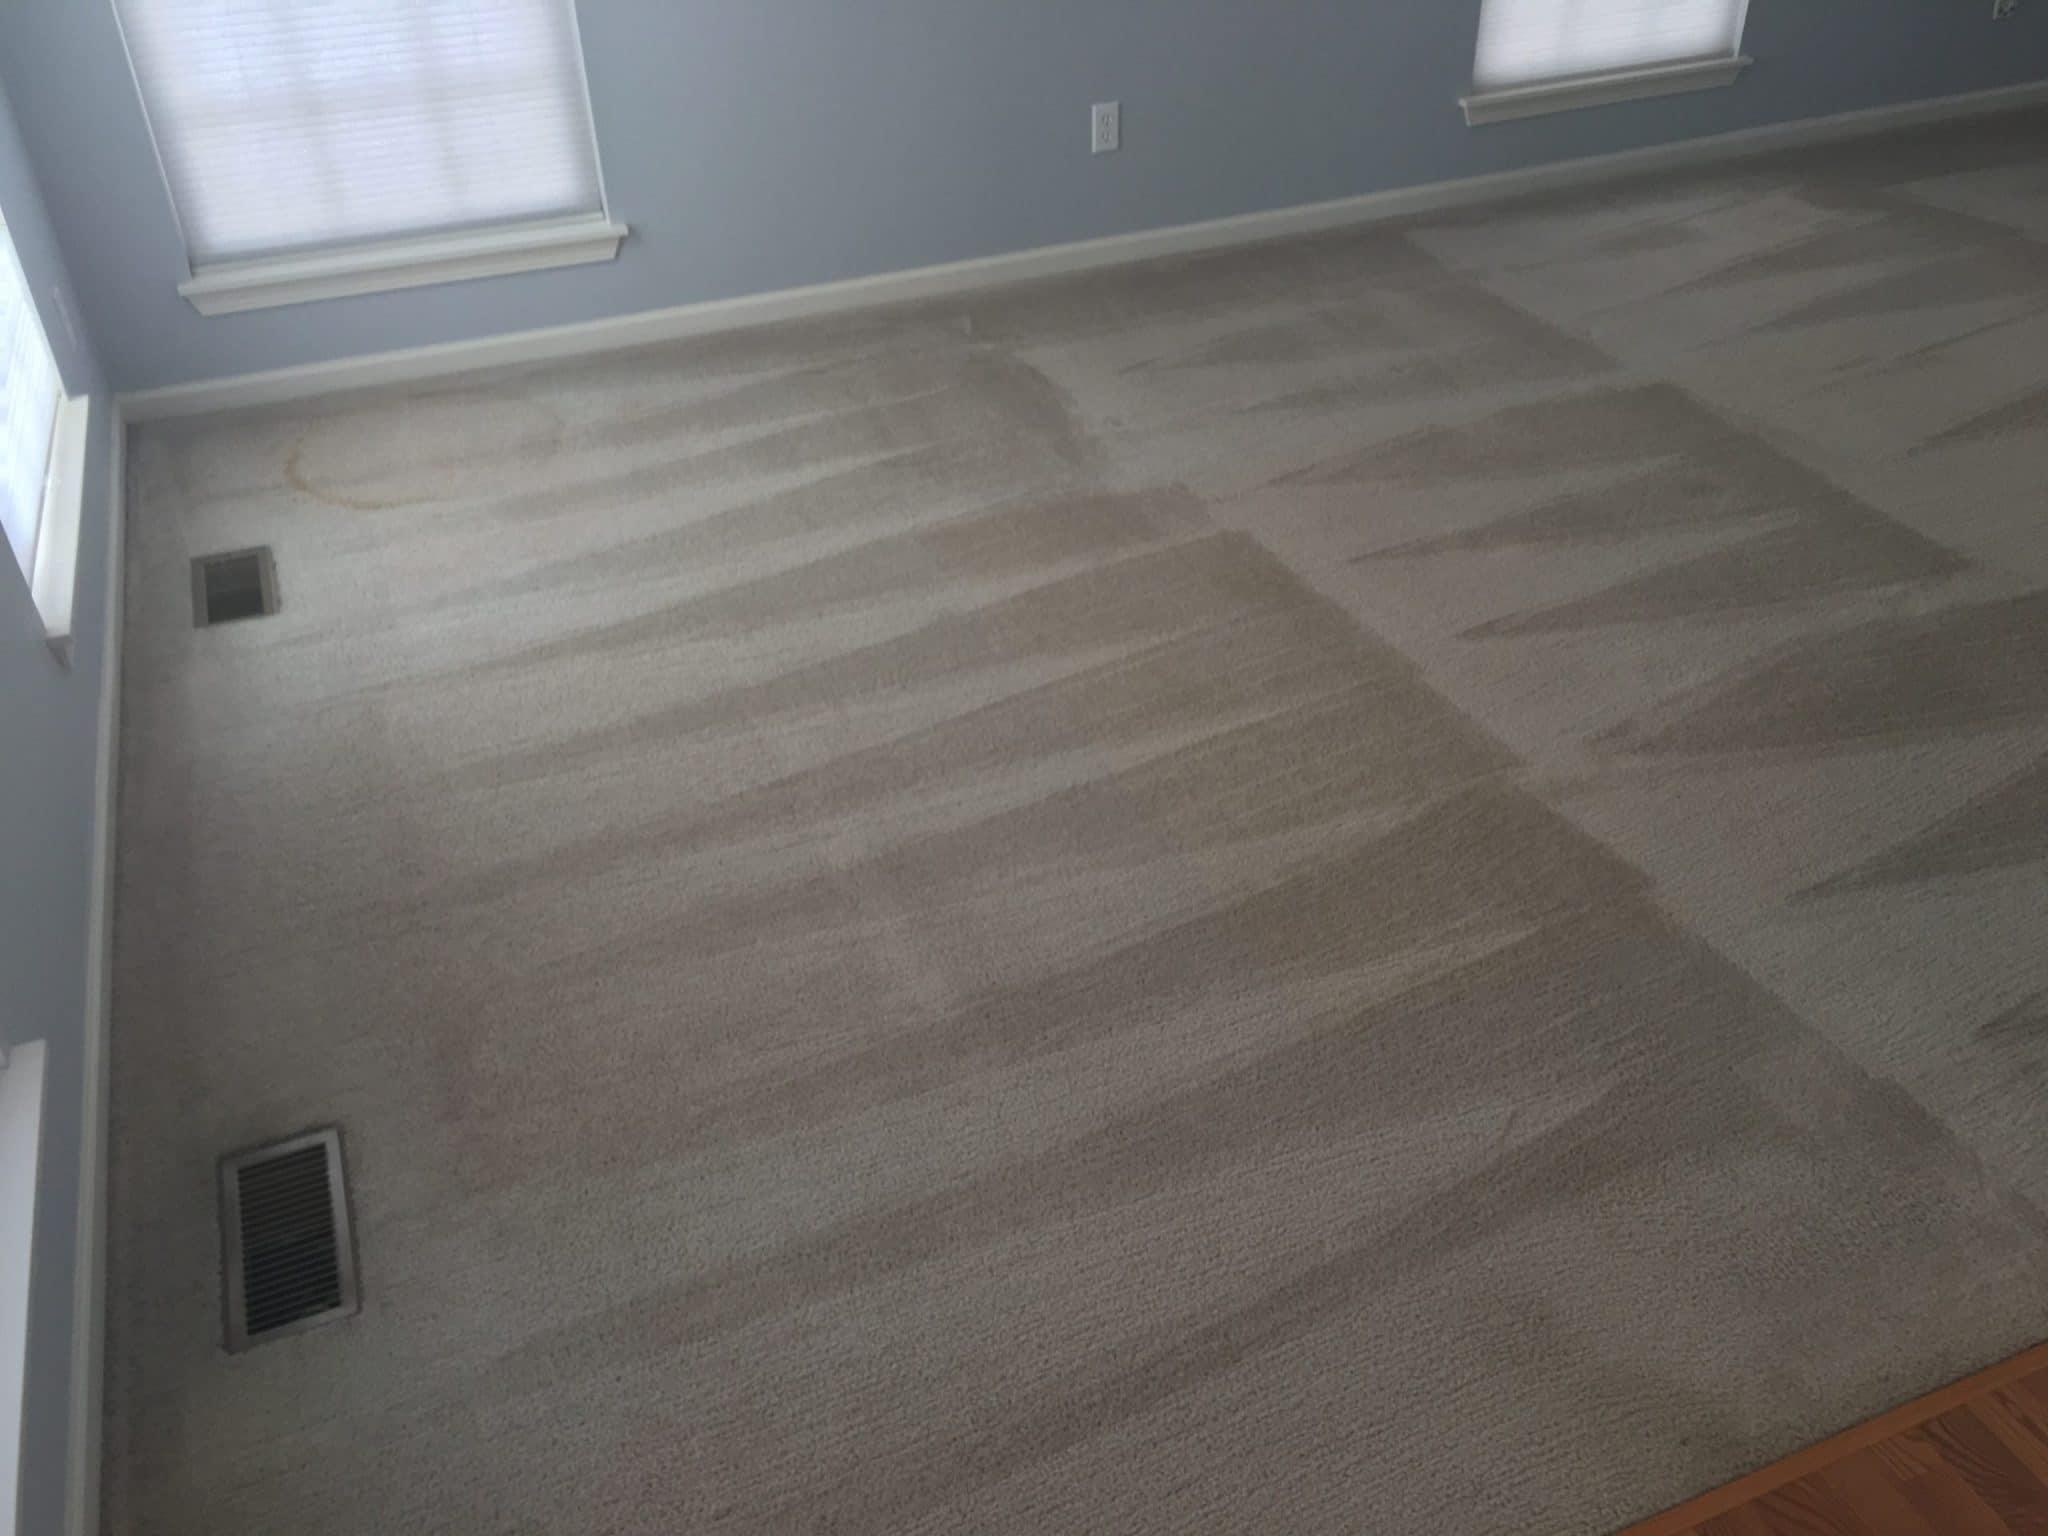 carpet cleaner in kenosha, the dry guys